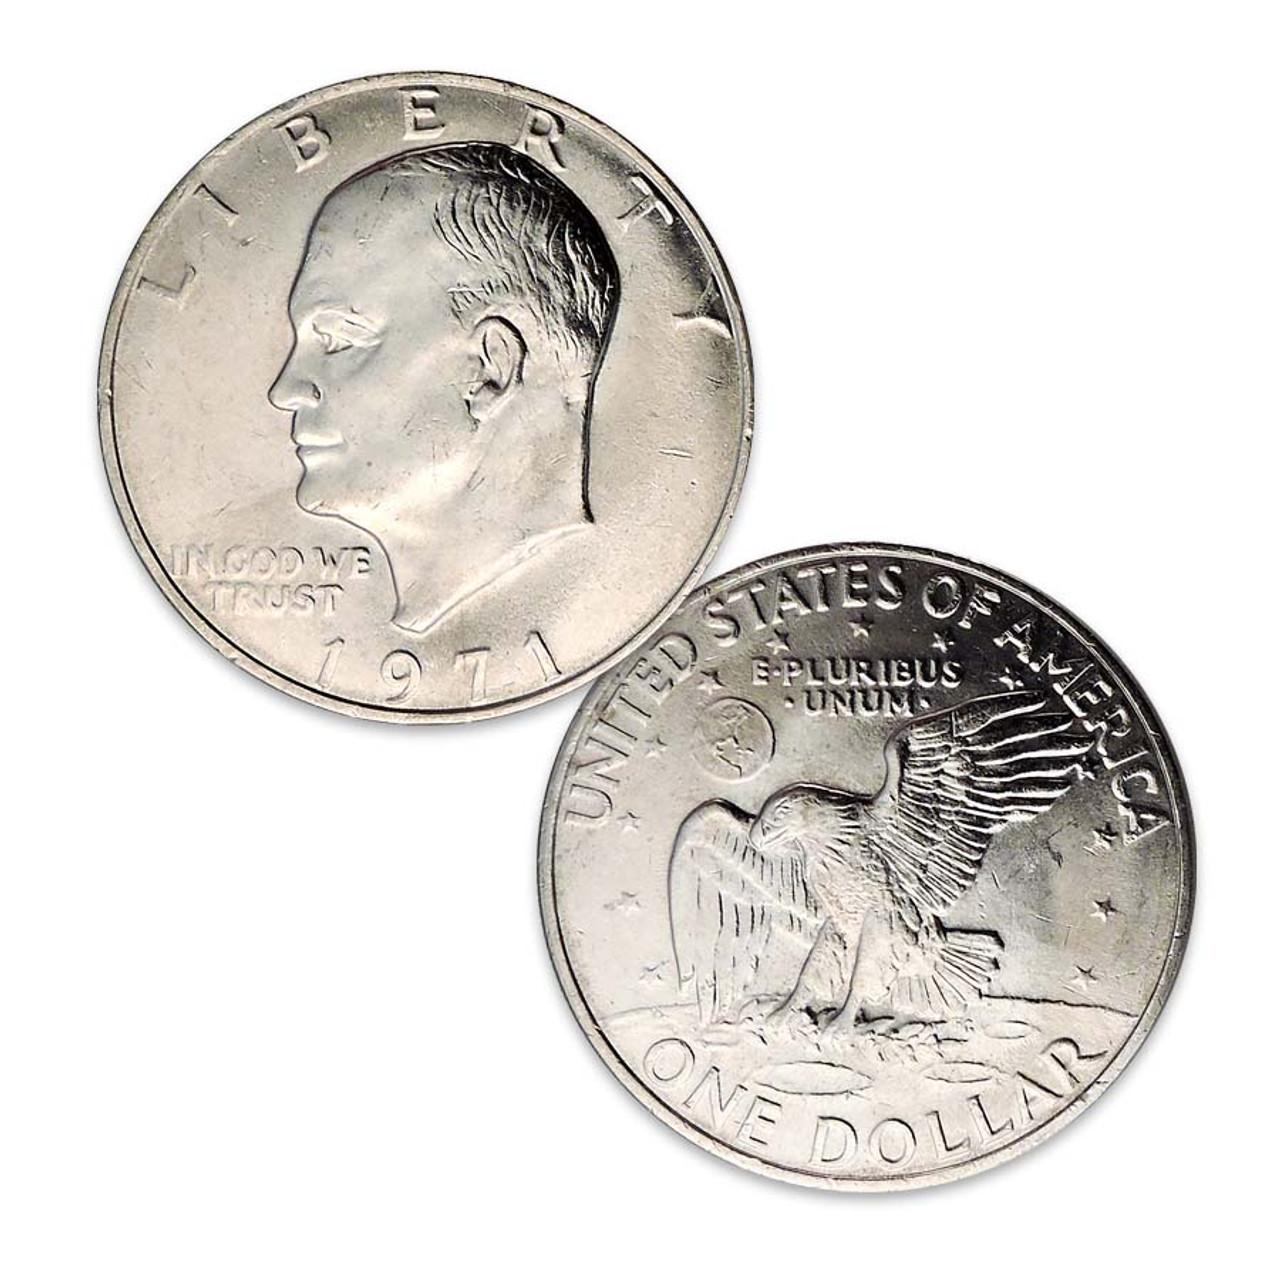 1971-P Eisenhower Dollar Brilliant Uncirculated Image 1